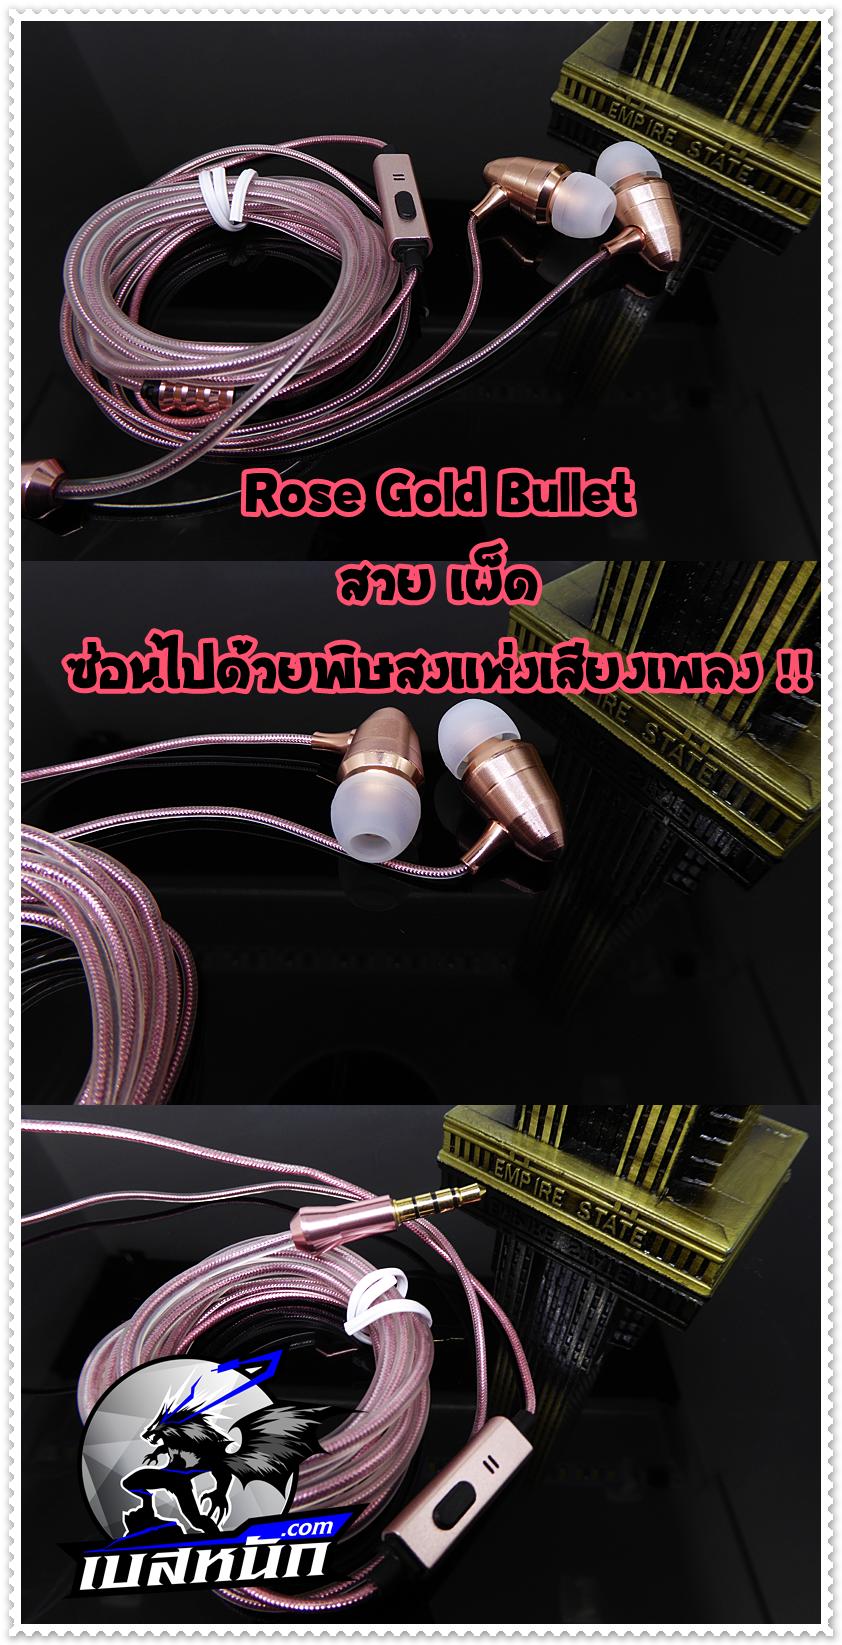 Rose Gold Bullet มหากาฬกระสุน ระห่ำหู!! (Small talk)